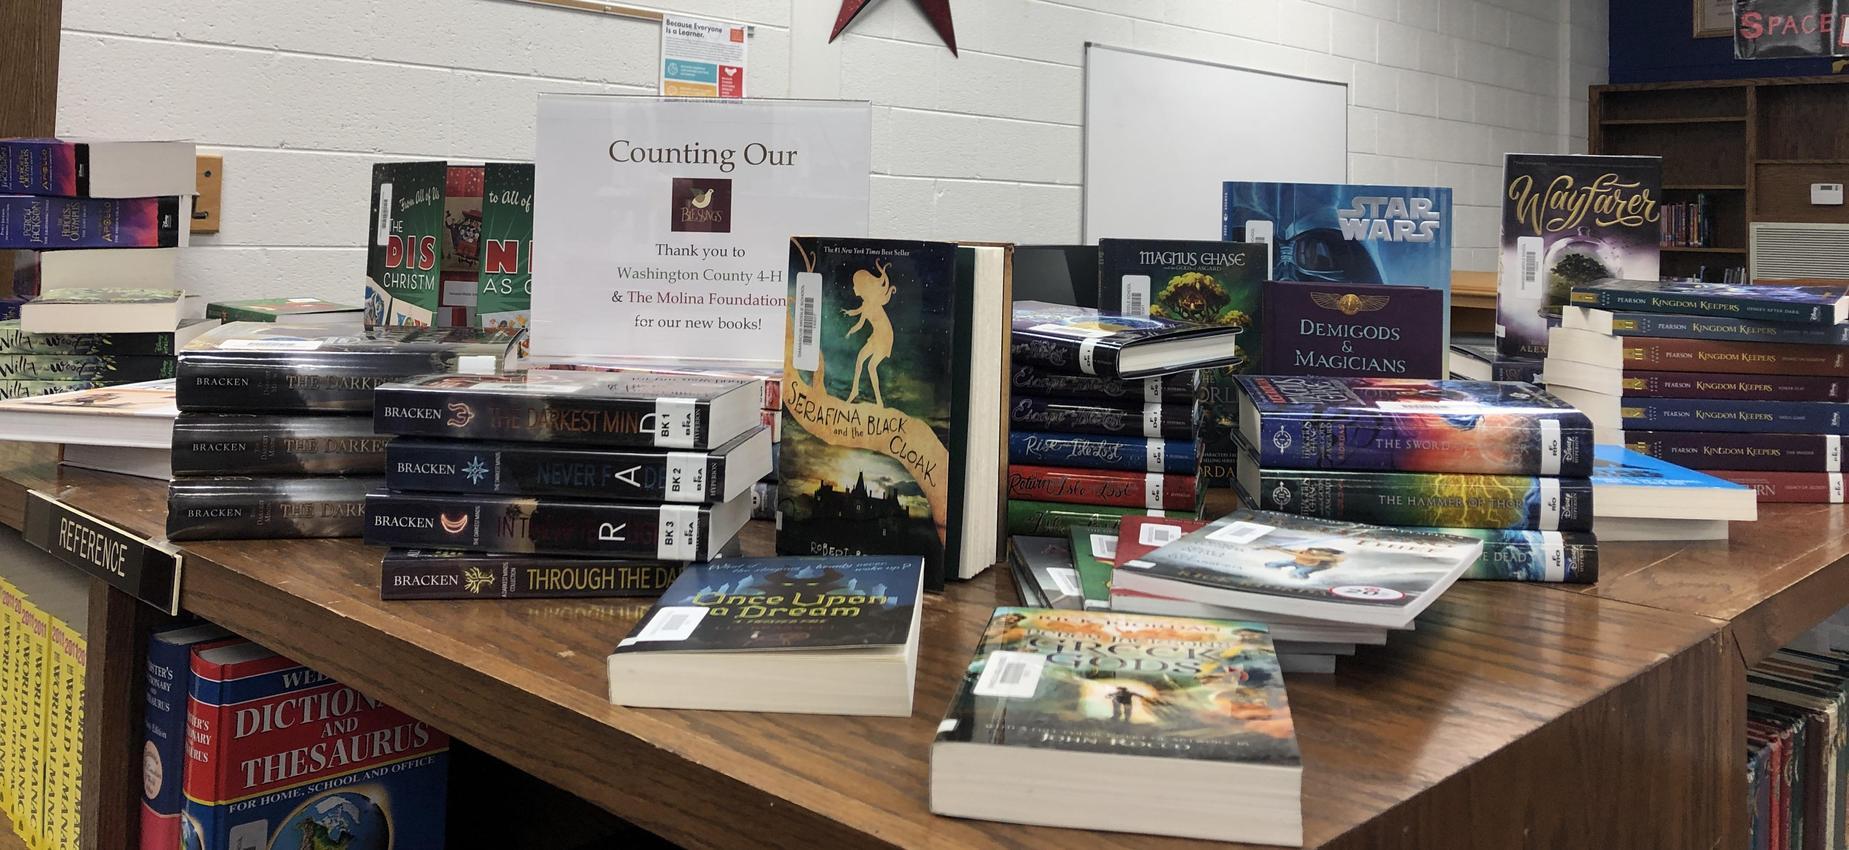 Books on top of a book shelf.